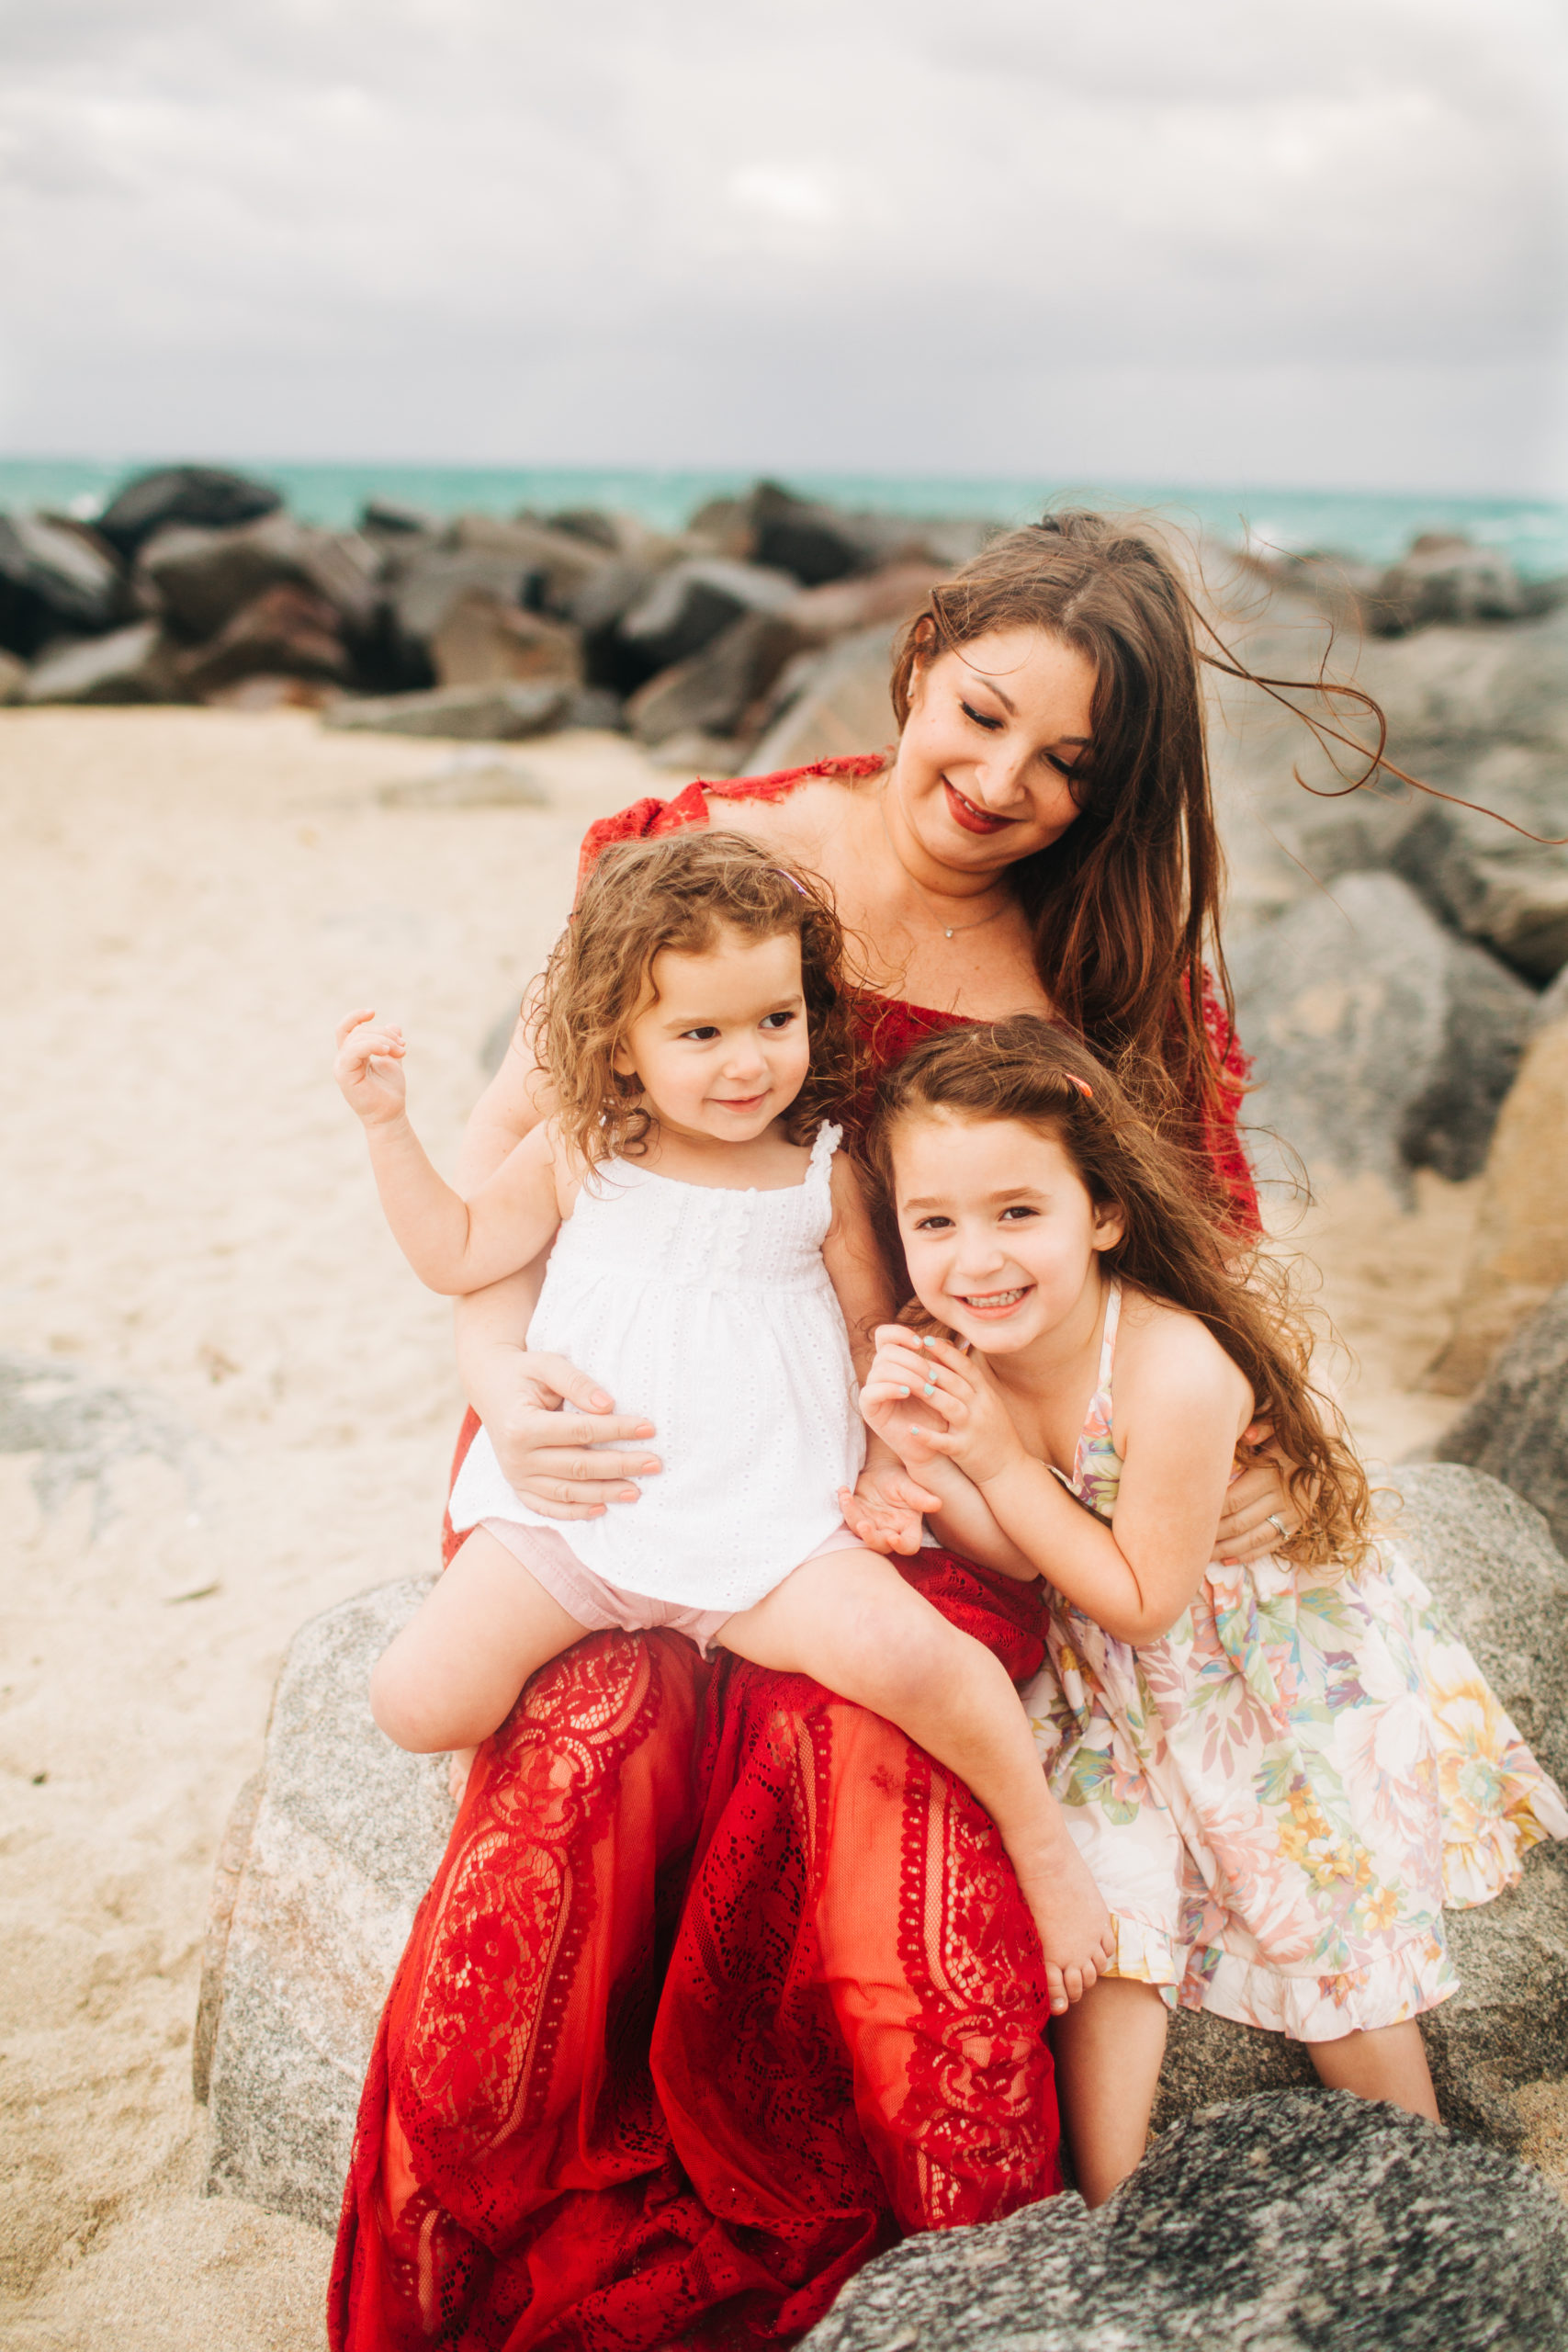 FamilySessionBeach_Alisa-17-scaled Miami's 8 best Photoshoot Locations